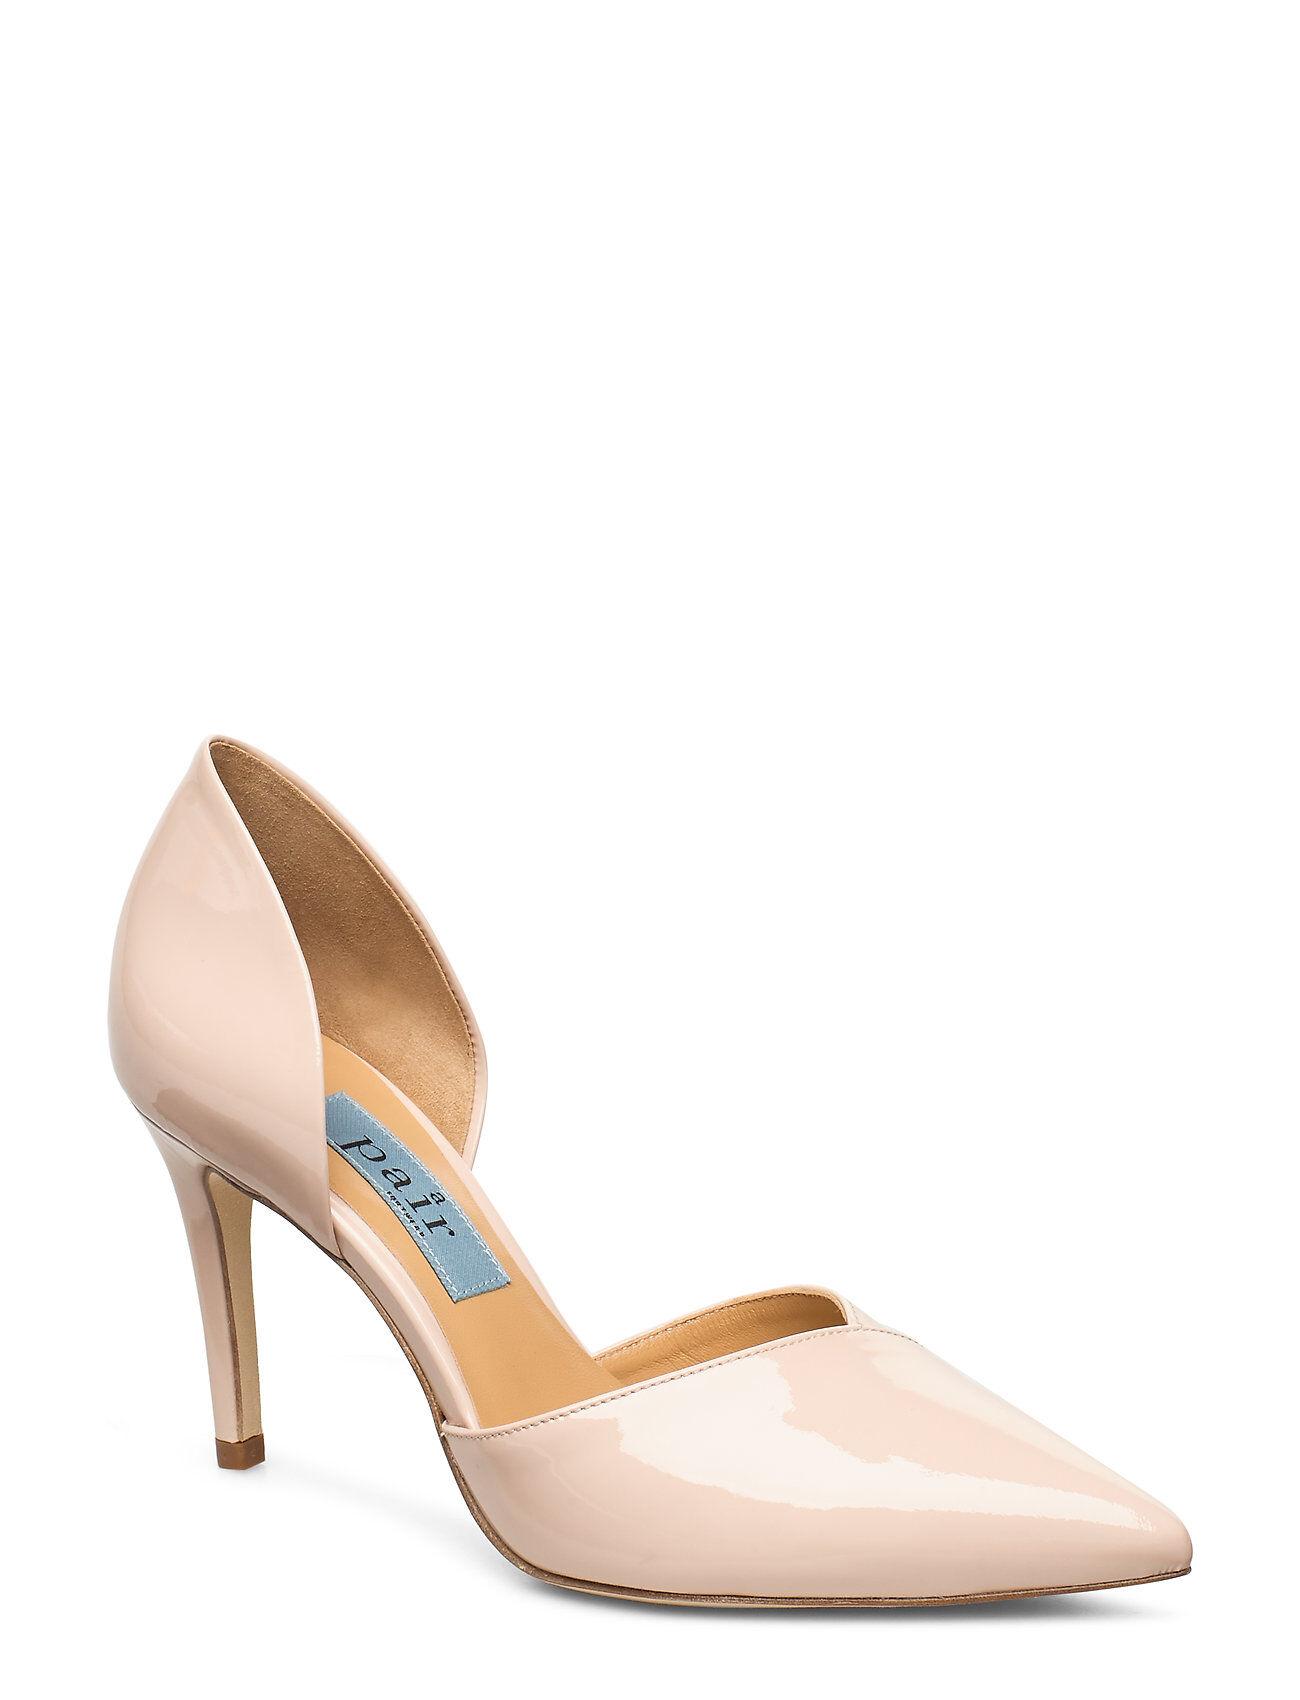 Apair Open Side High Stiletto Shoes Heels Pumps Classic Beige Apair